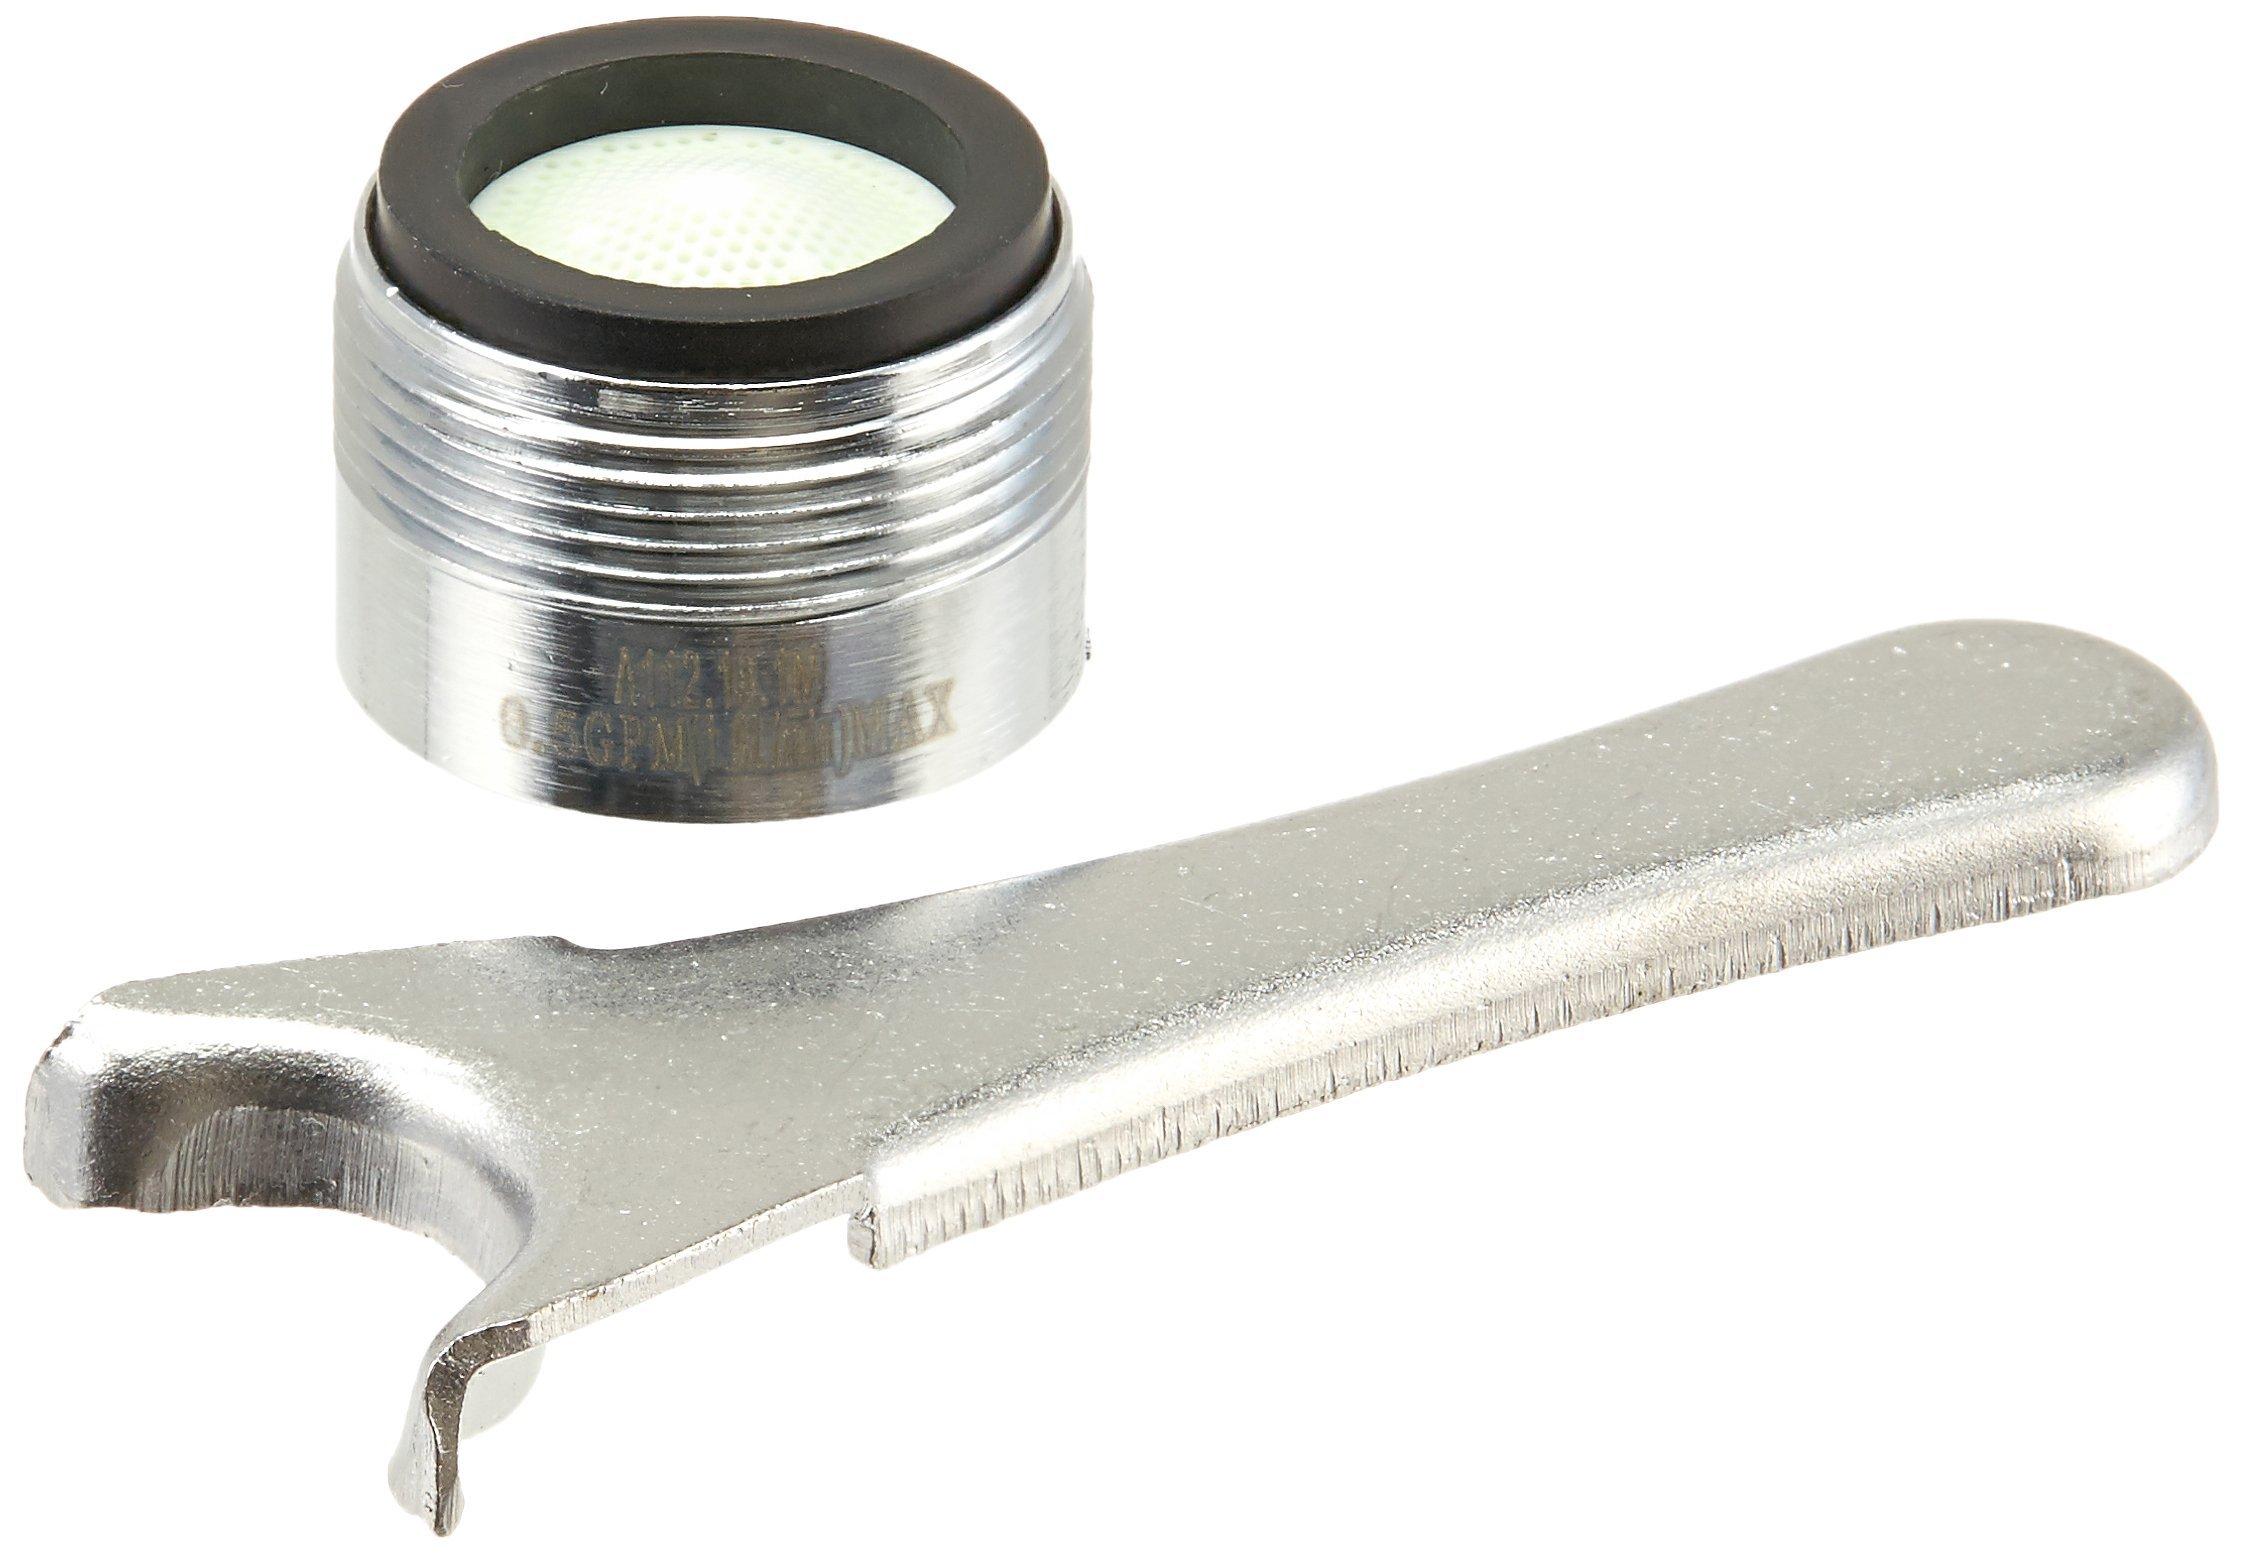 Danze DA613075N Junior Male Spray Faucet Aerator Kit, 0.5 GPM, Chrome